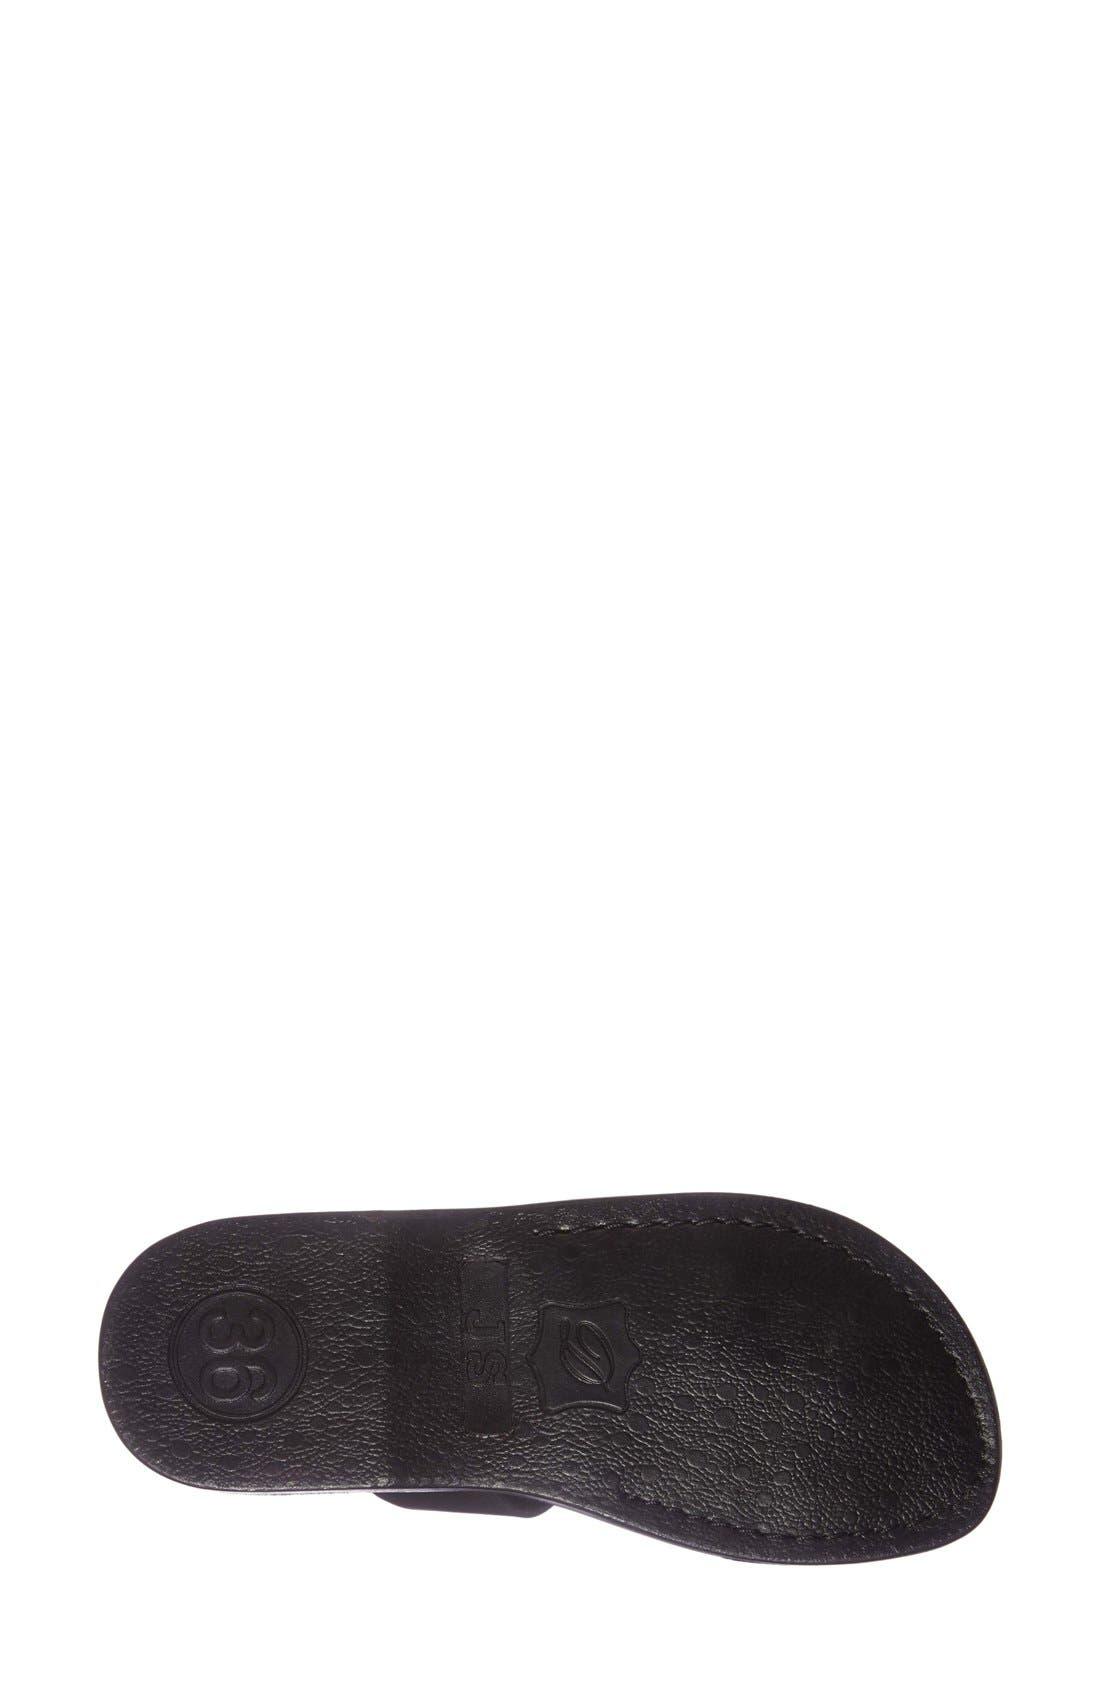 'The Good Shepard' Leather Sandal,                             Alternate thumbnail 26, color,